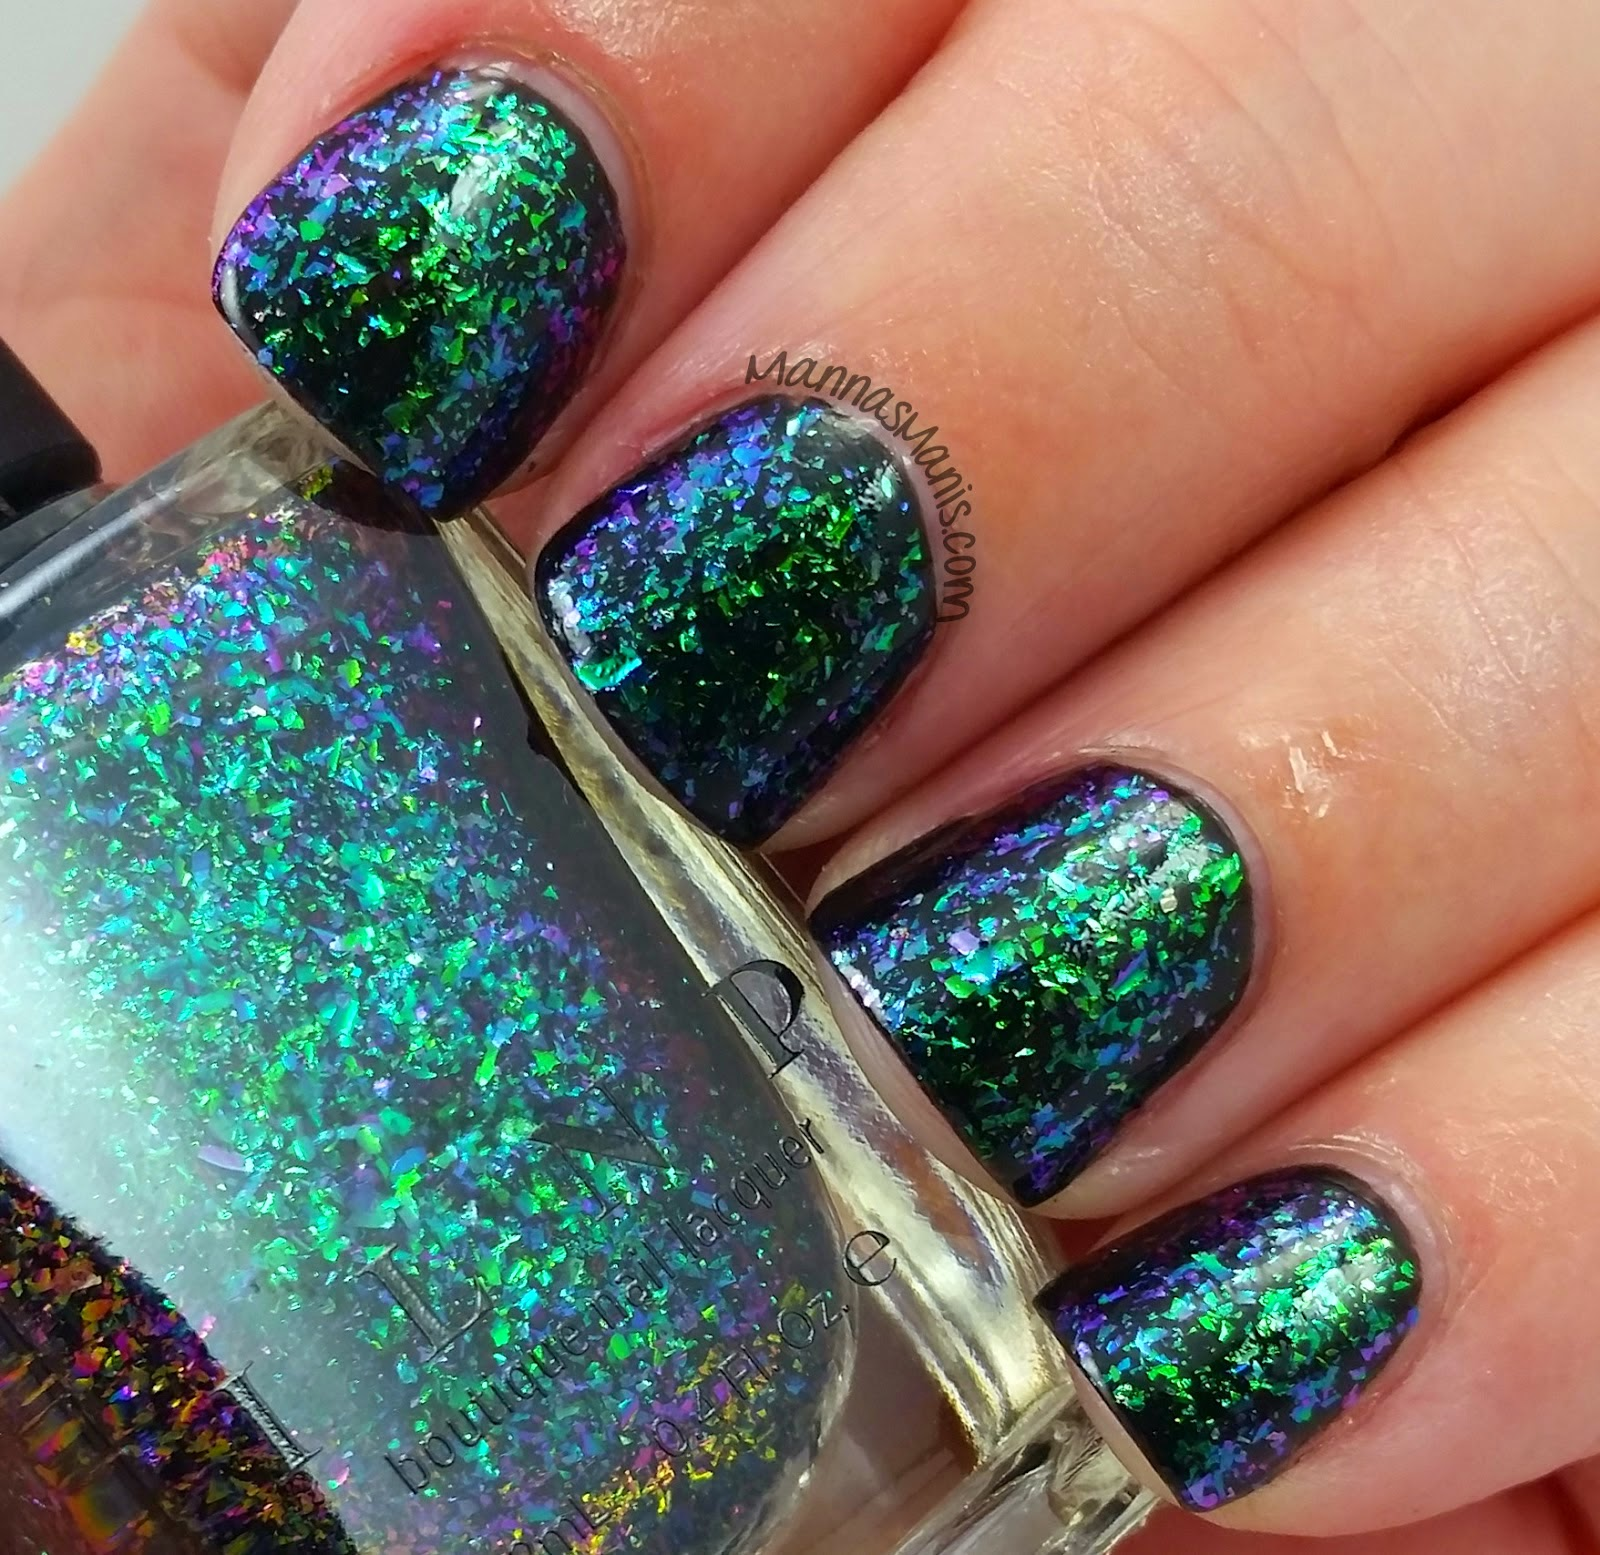 flakie nail polish